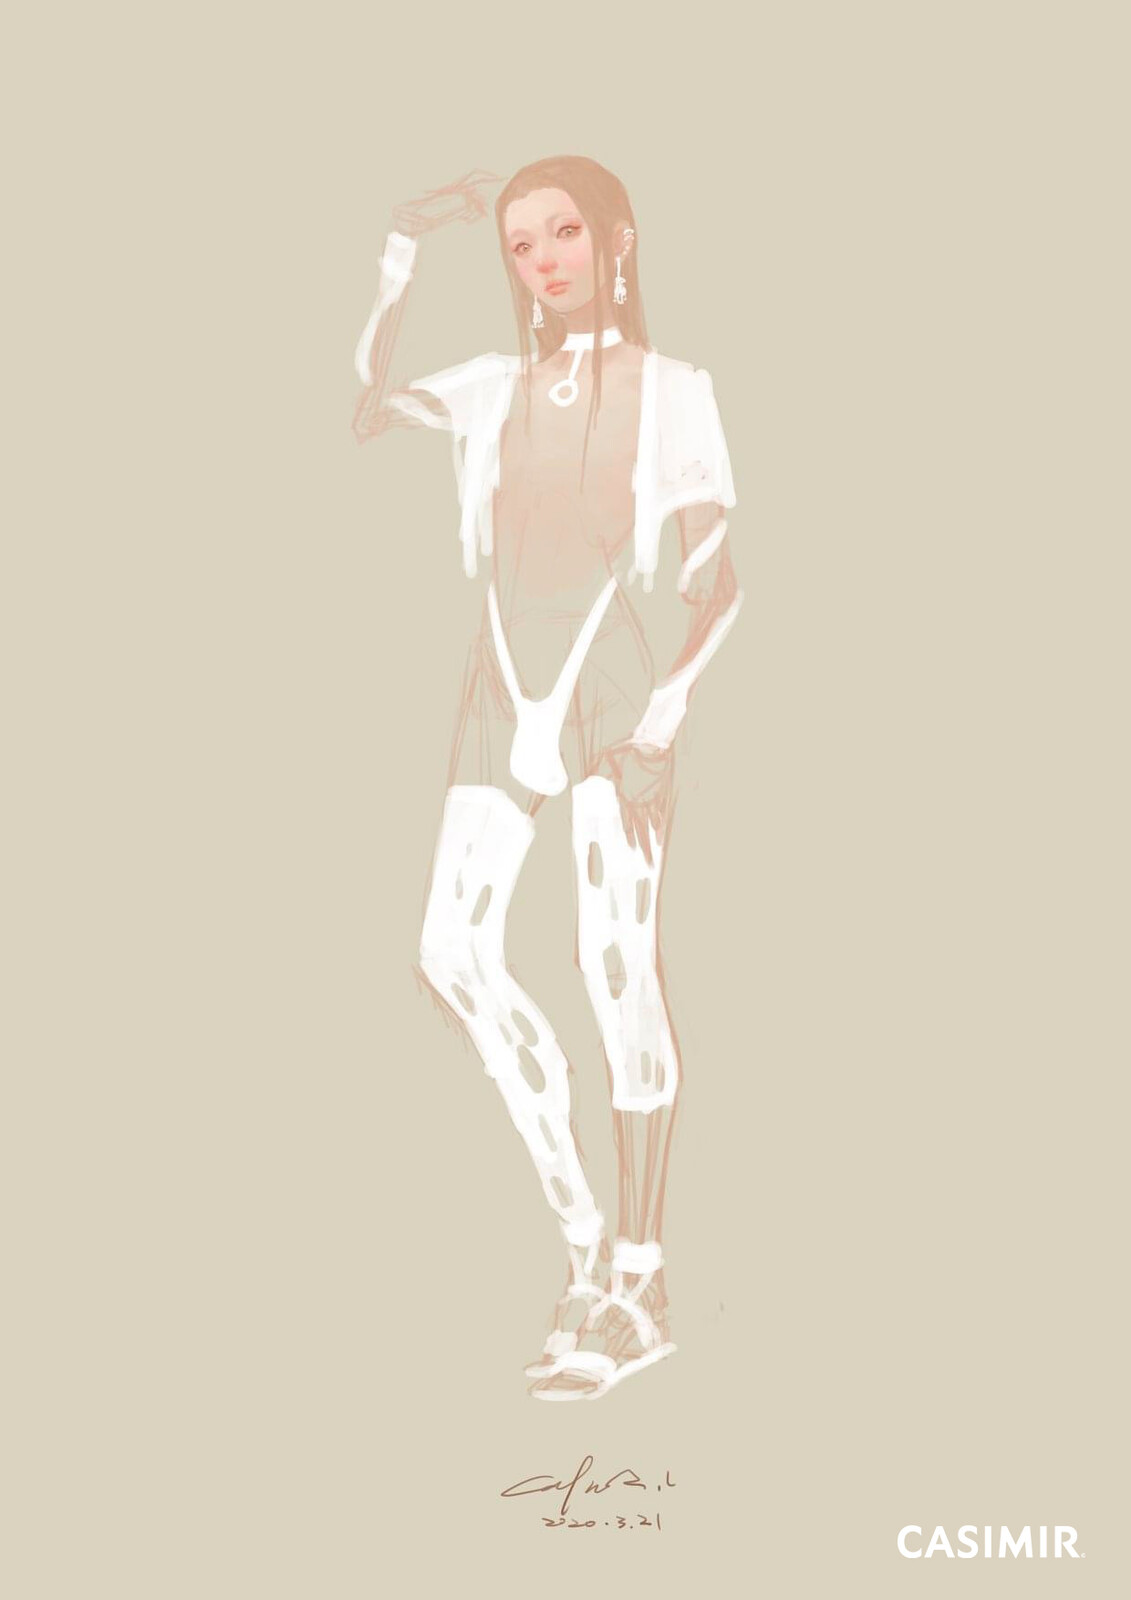 CASIMIR ART   http://www.casimirart.com  #ArtCASIMIR #CASIMIR #CASIMIRArt #female #drawing #fineart #painting #limitedprint #arterotica #eroticart #塔羅牌 #塔羅 #Tarot #tarot_card #tarot_cards